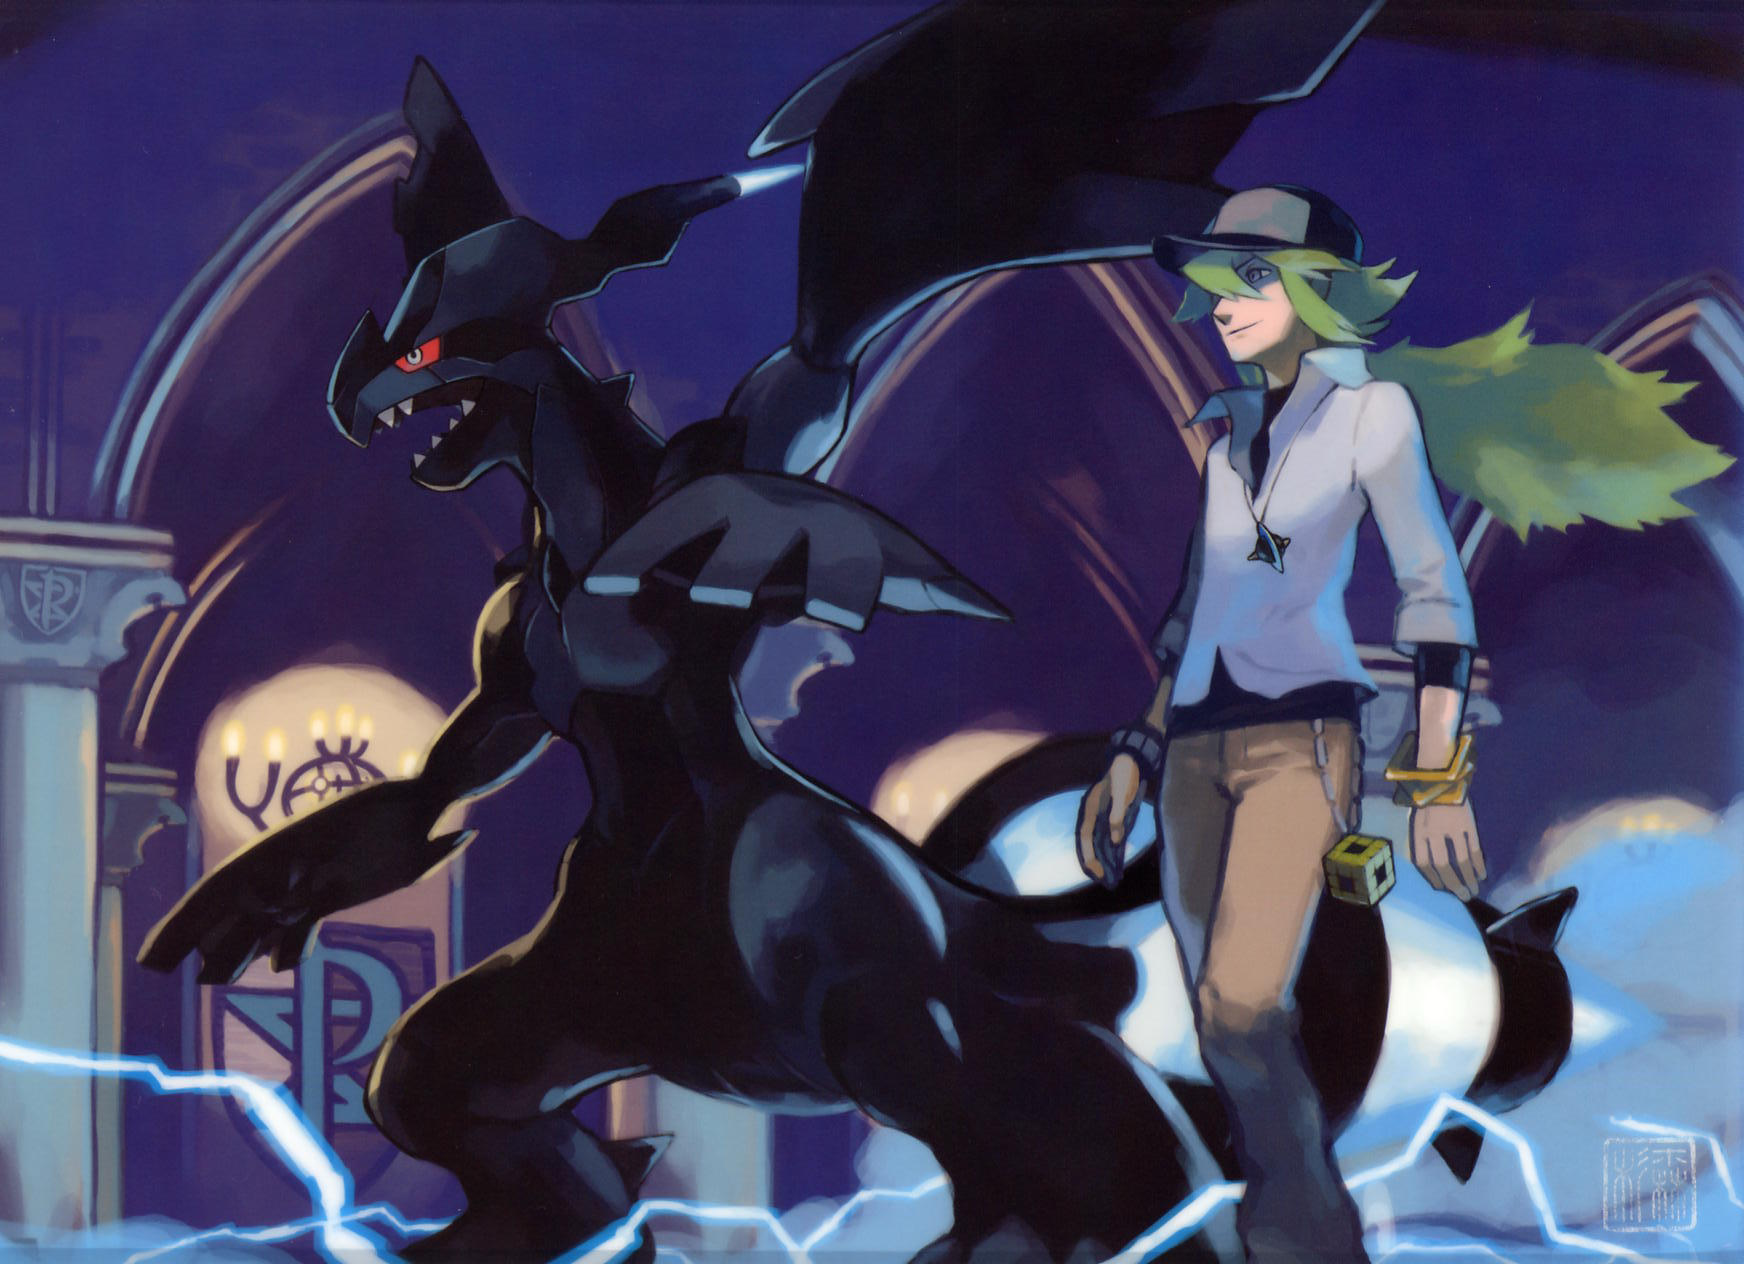 Personajes eventuales del anime